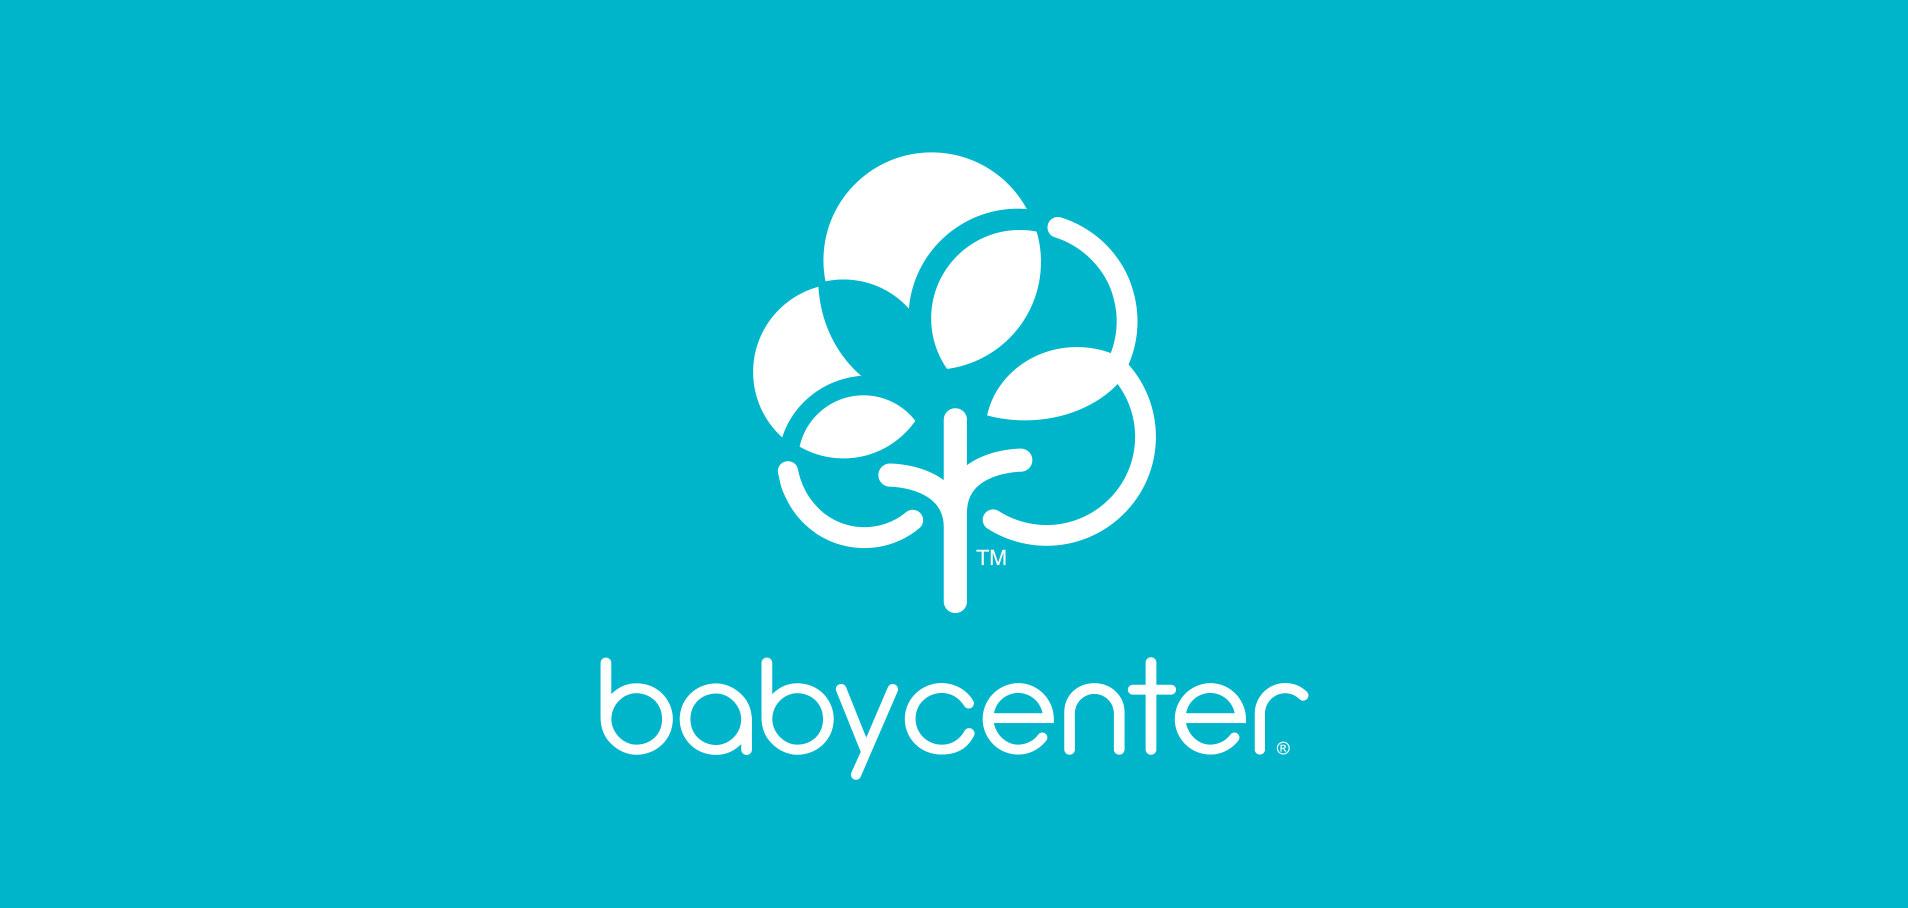 Baby center logo image